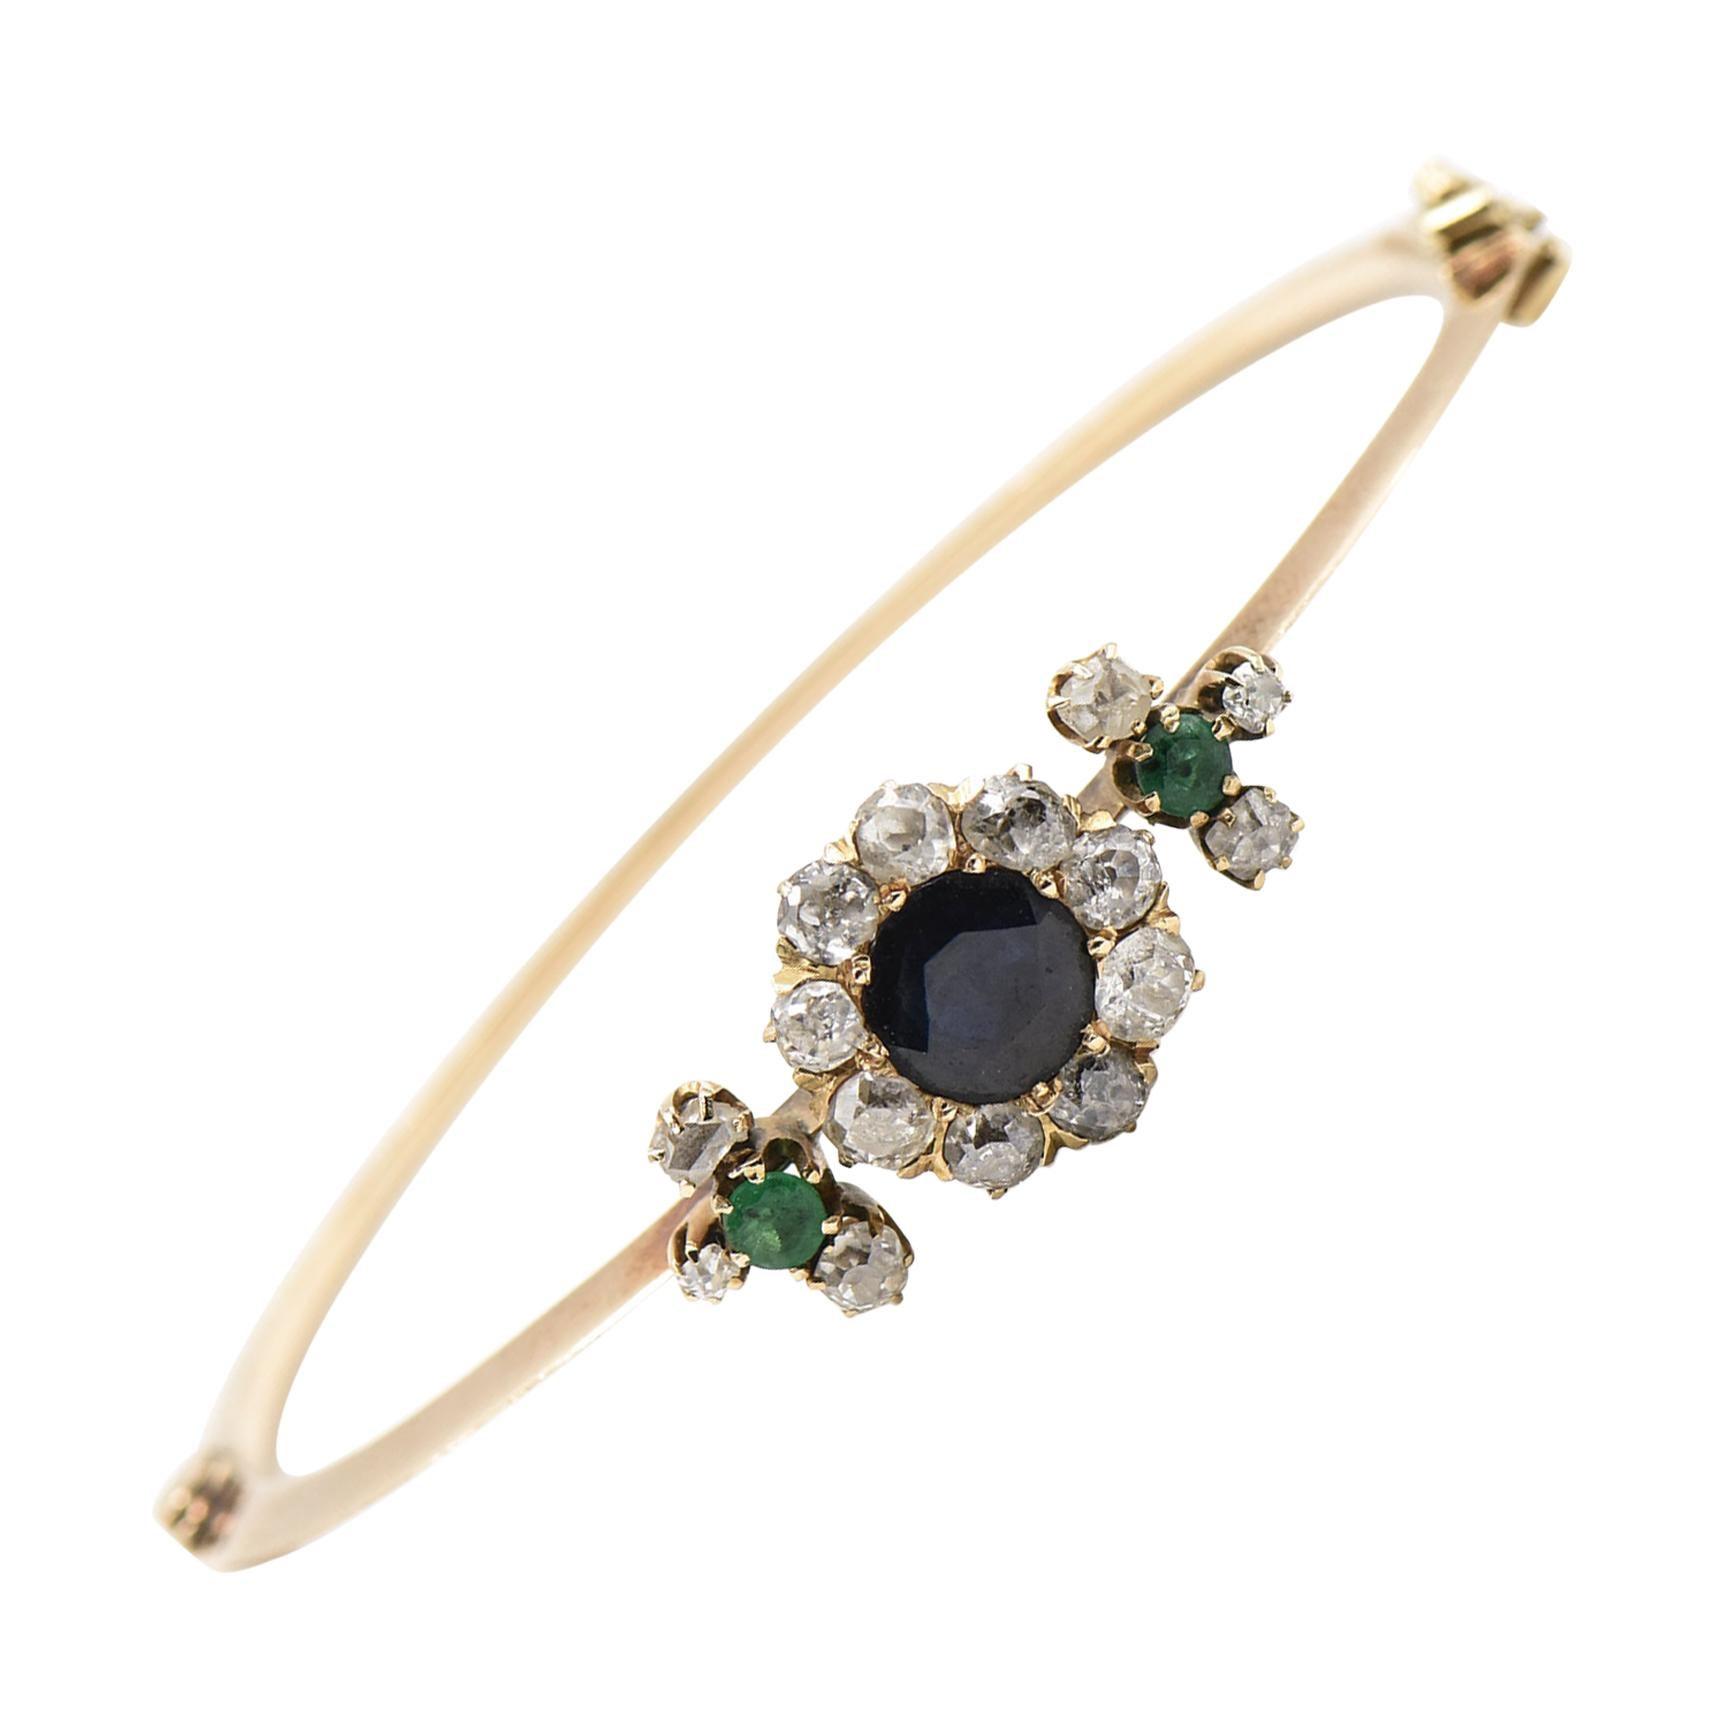 Antique Victorian Sapphire Emerald Diamond Flower Gold Bangle Bracelet